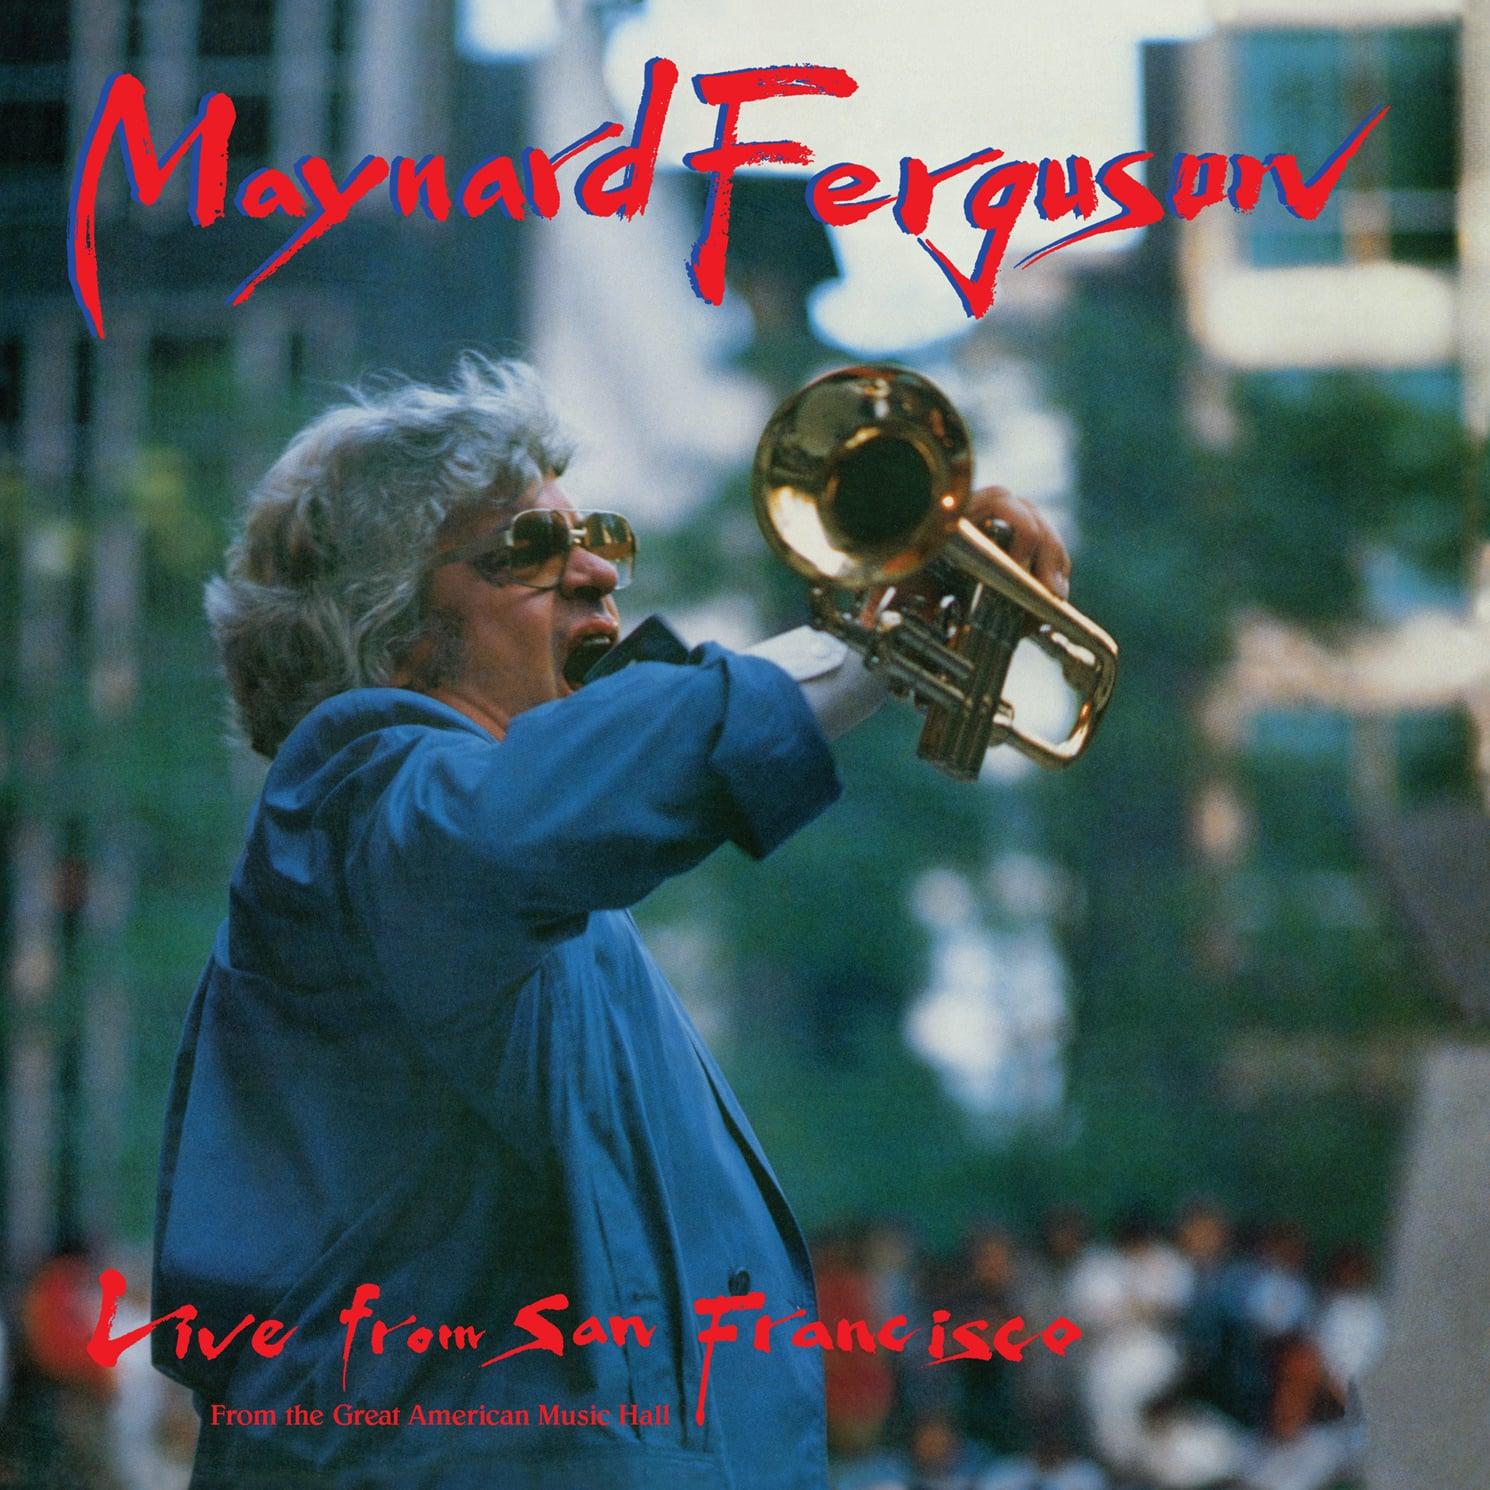 Maynard Ferguson - Live From San Francisco  Release Date: December 18, 2015 Label: Omnivore Recordings  SERVICE: Mastering NUMBER OF DISCS: 1 GENRE: Jazz FORMAT: CD   TRAILER